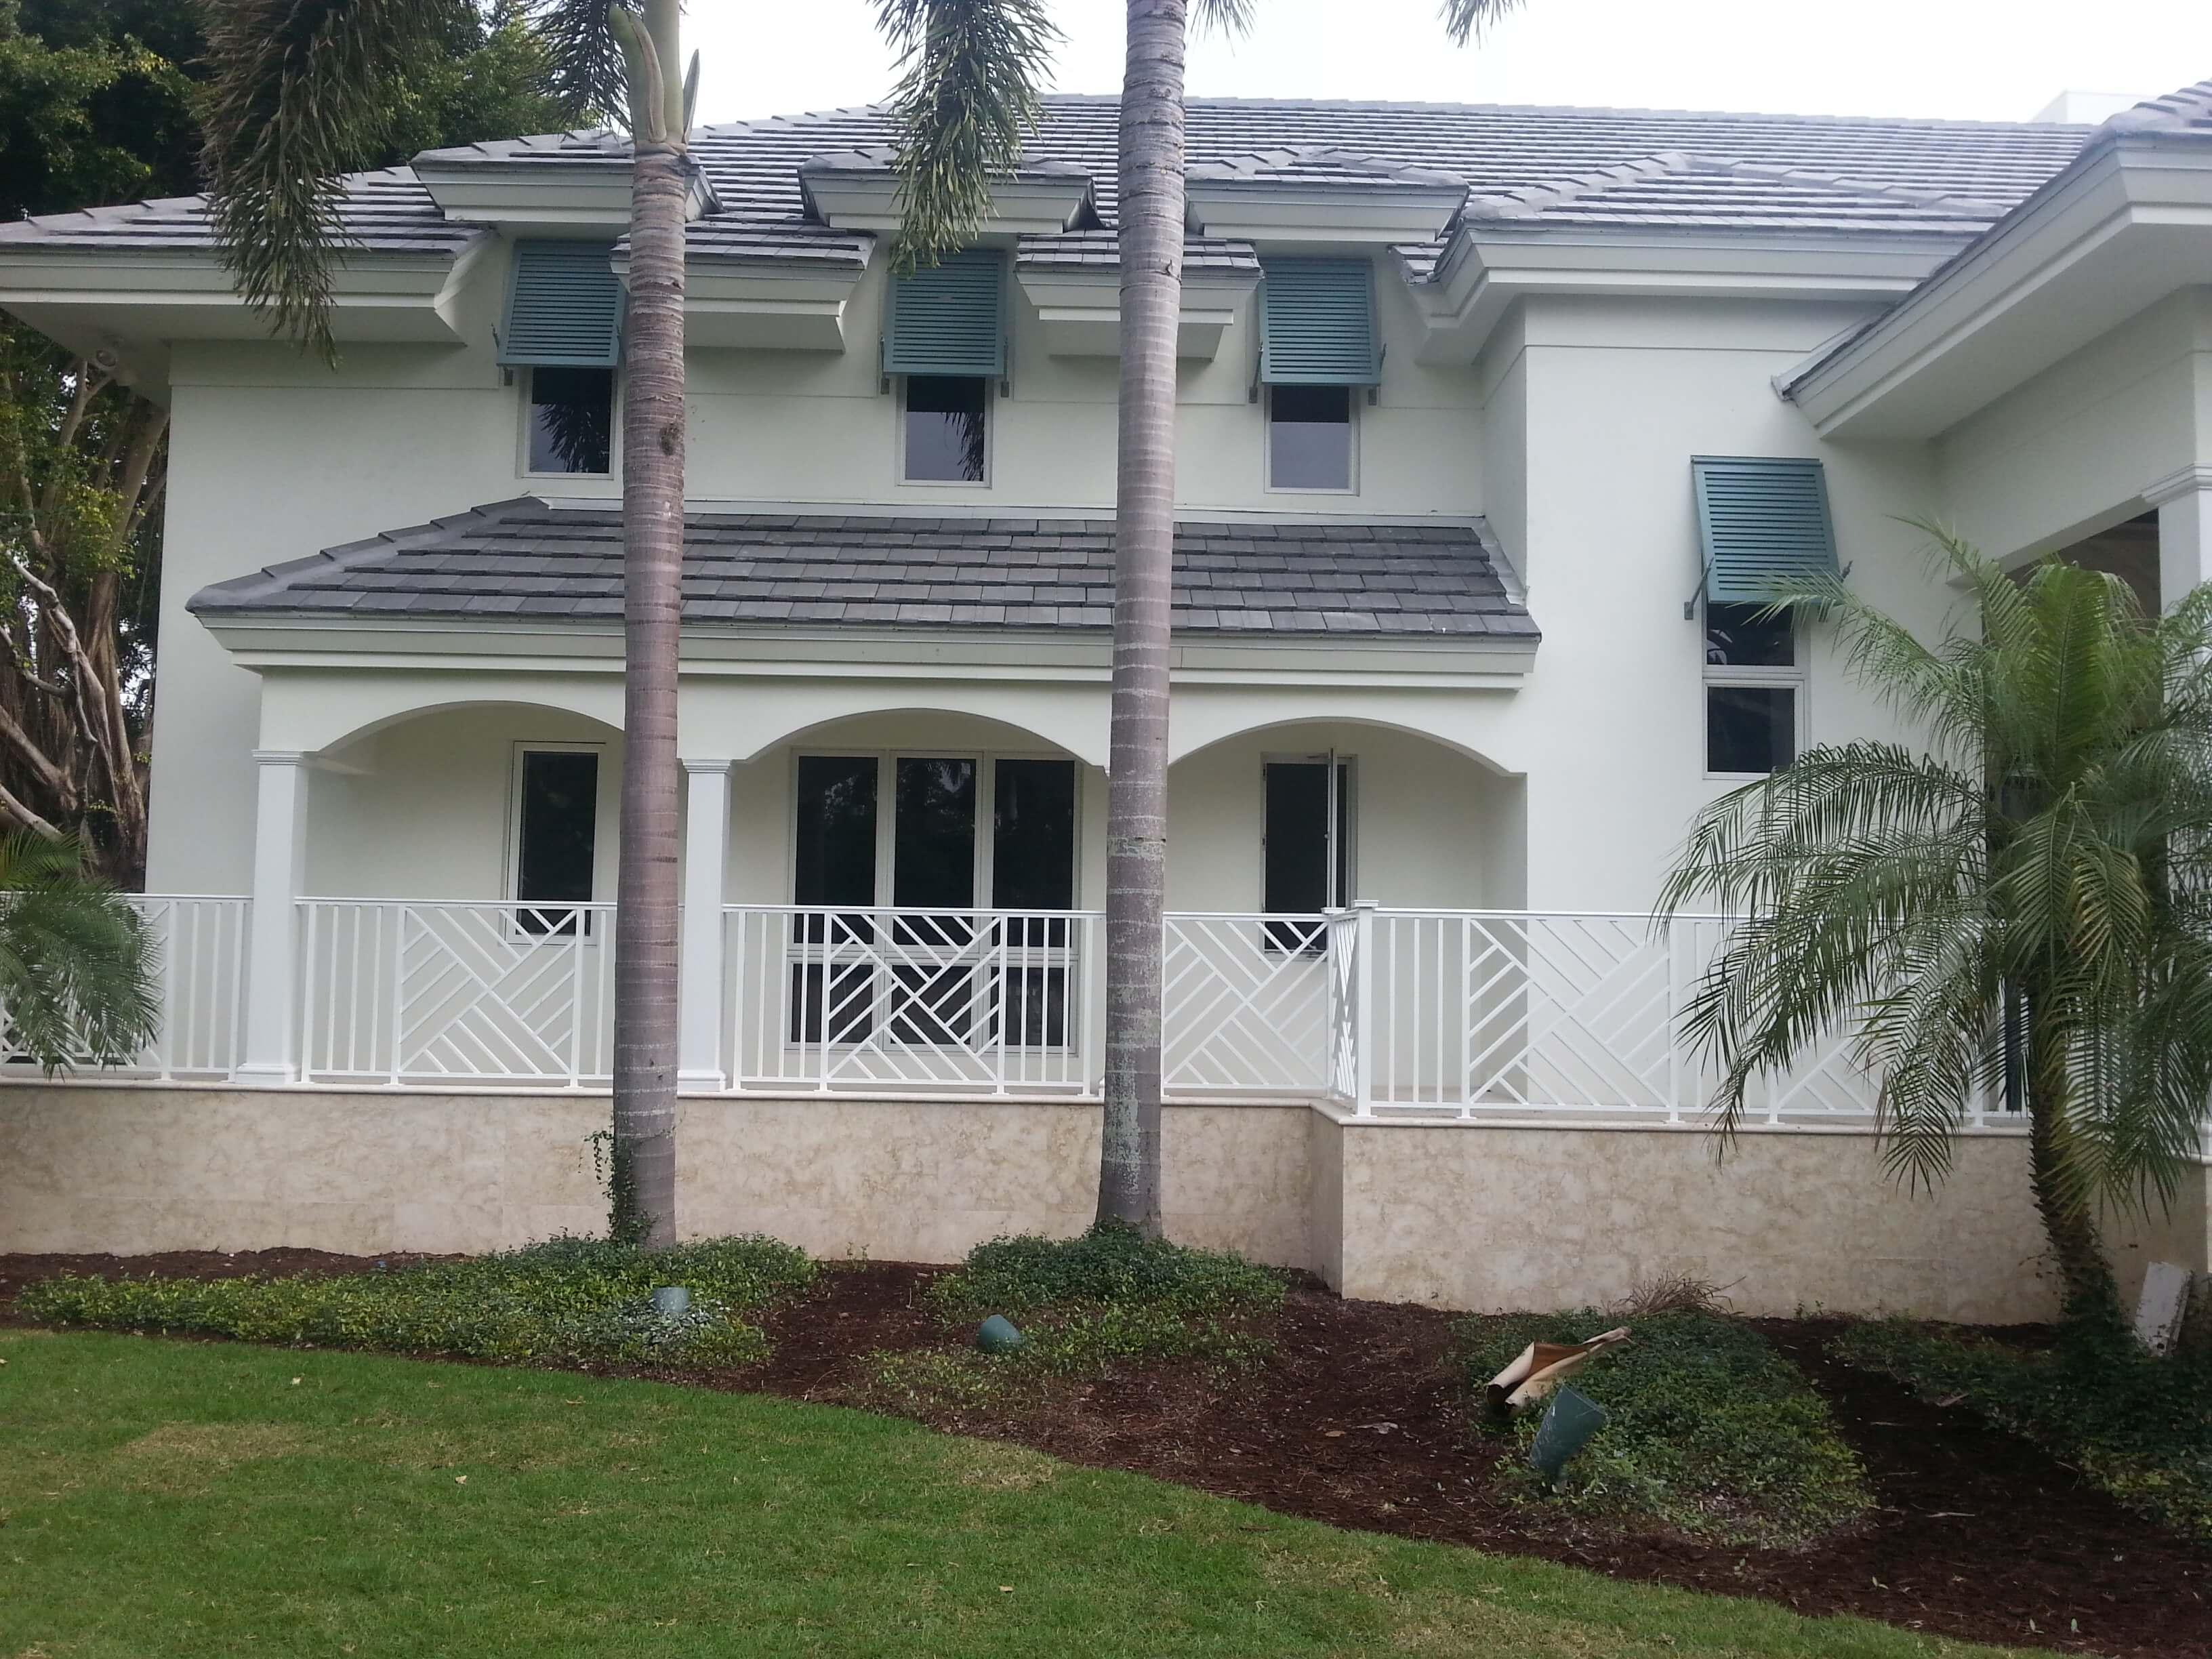 Custom railings and shutters